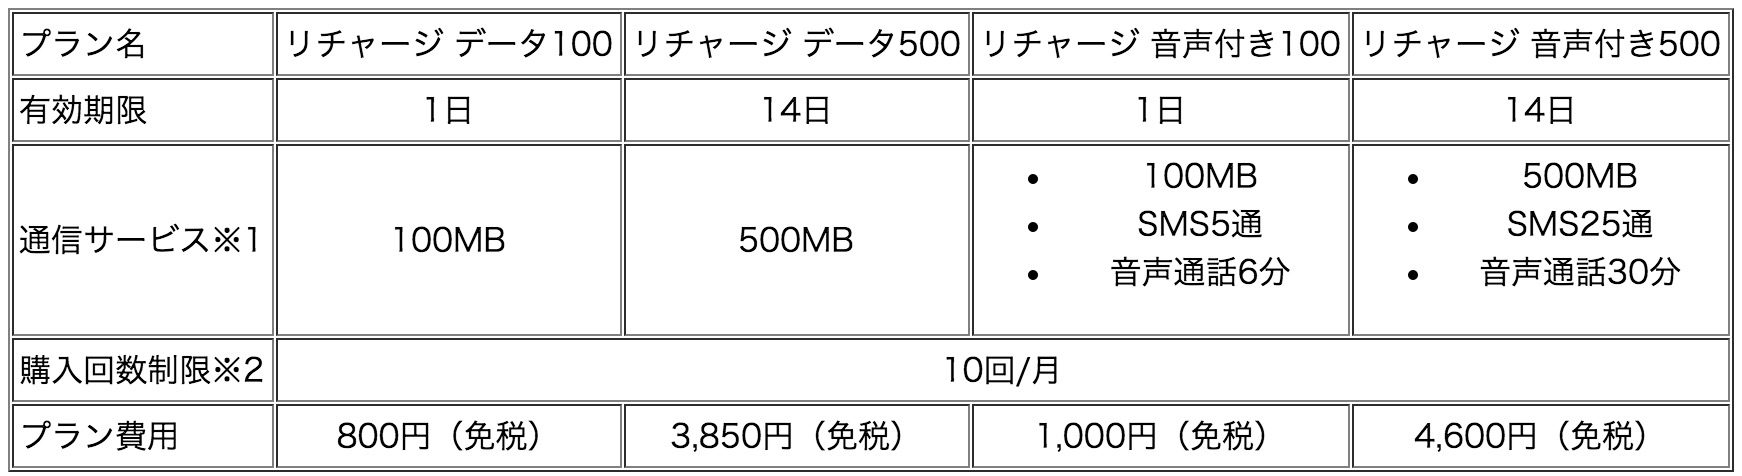 ss 2016-08-10 16.02.56